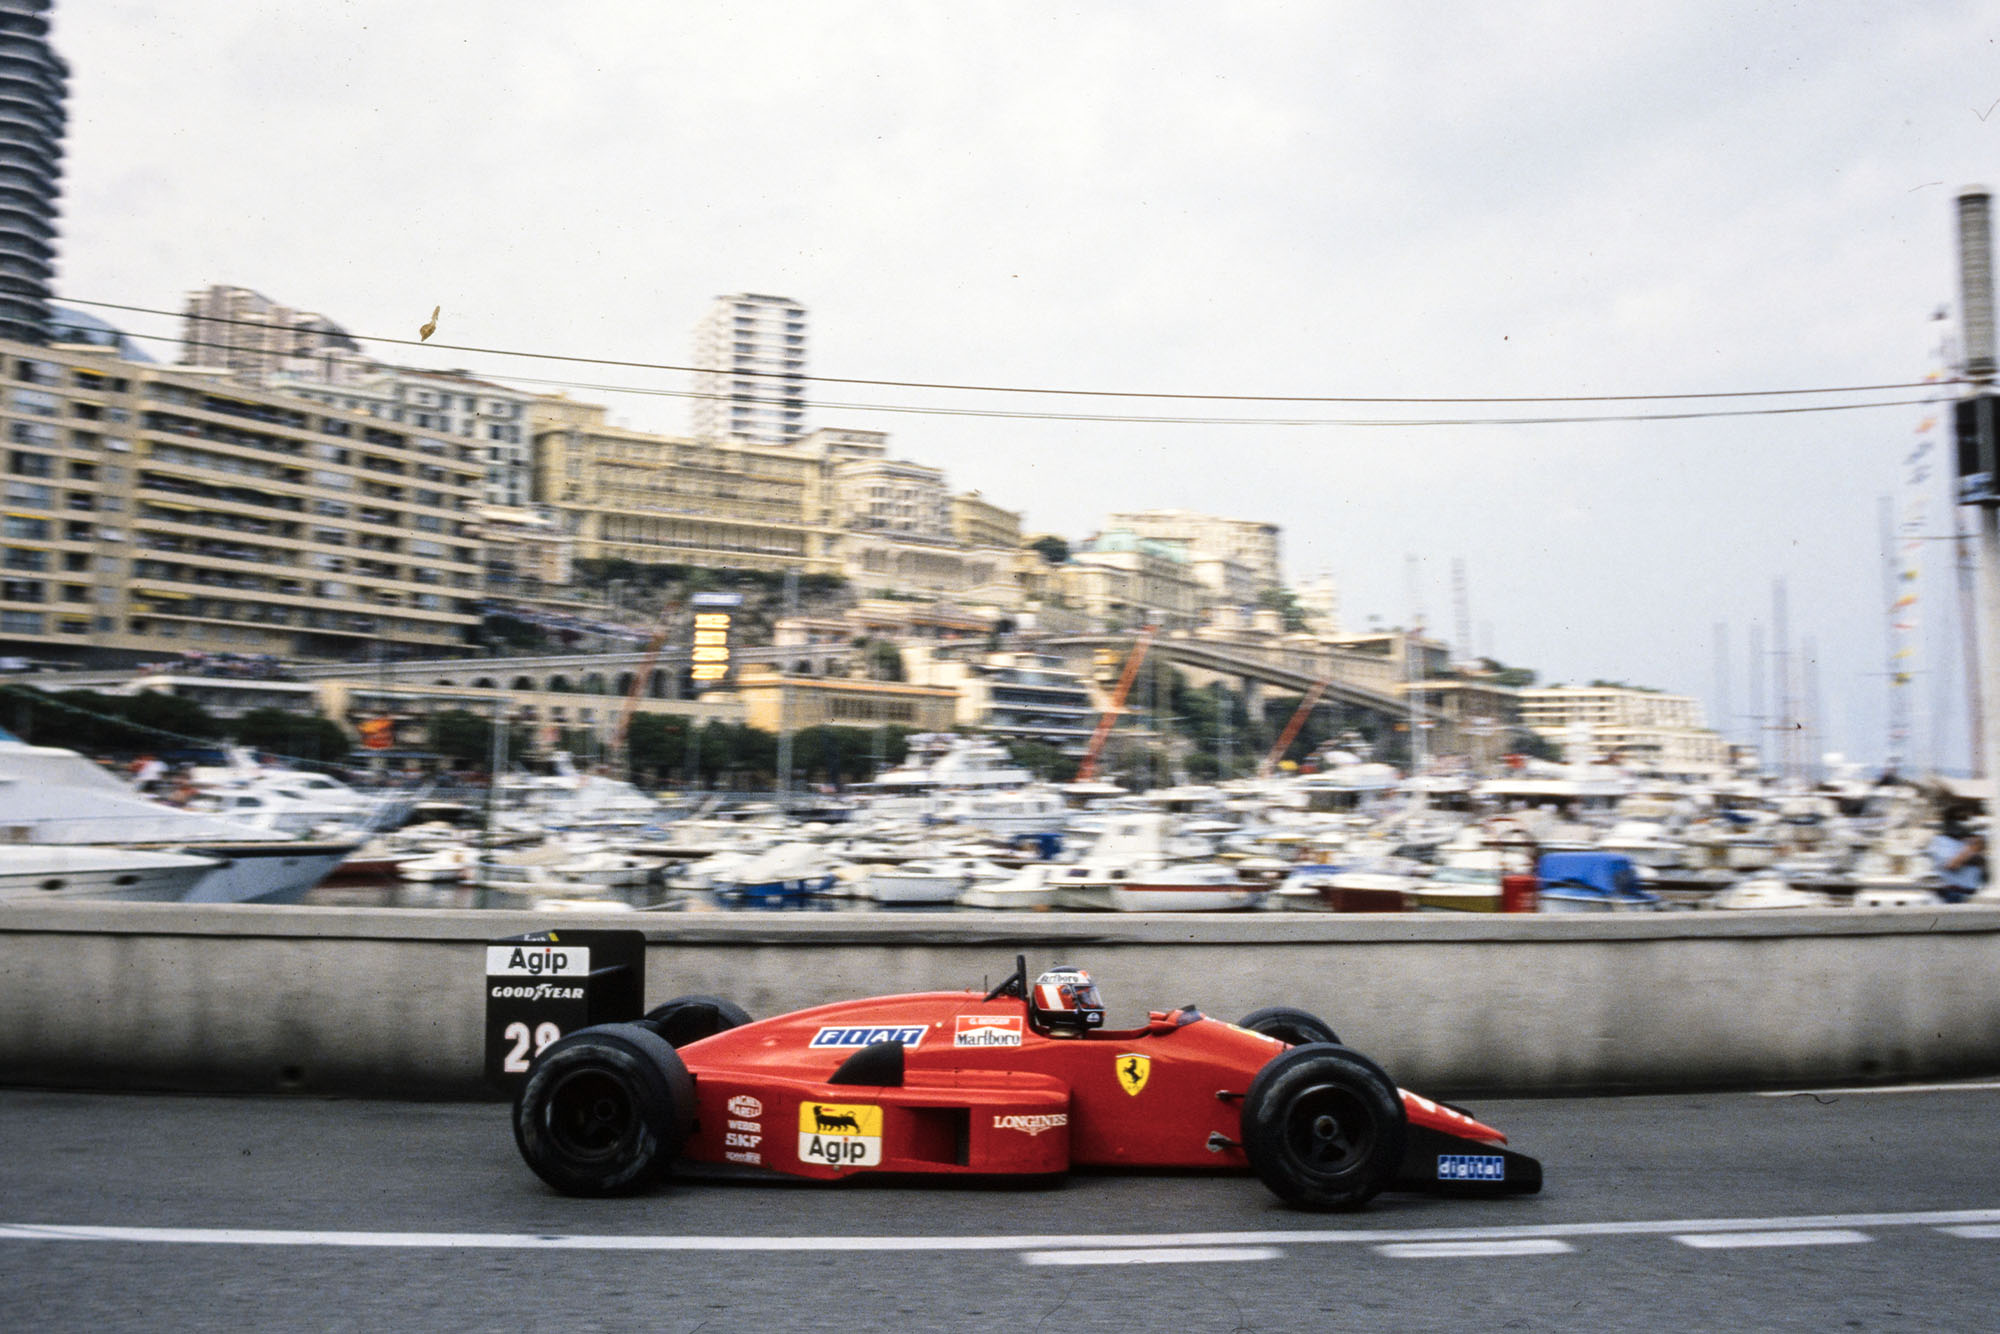 1988 MON GP Berger 3